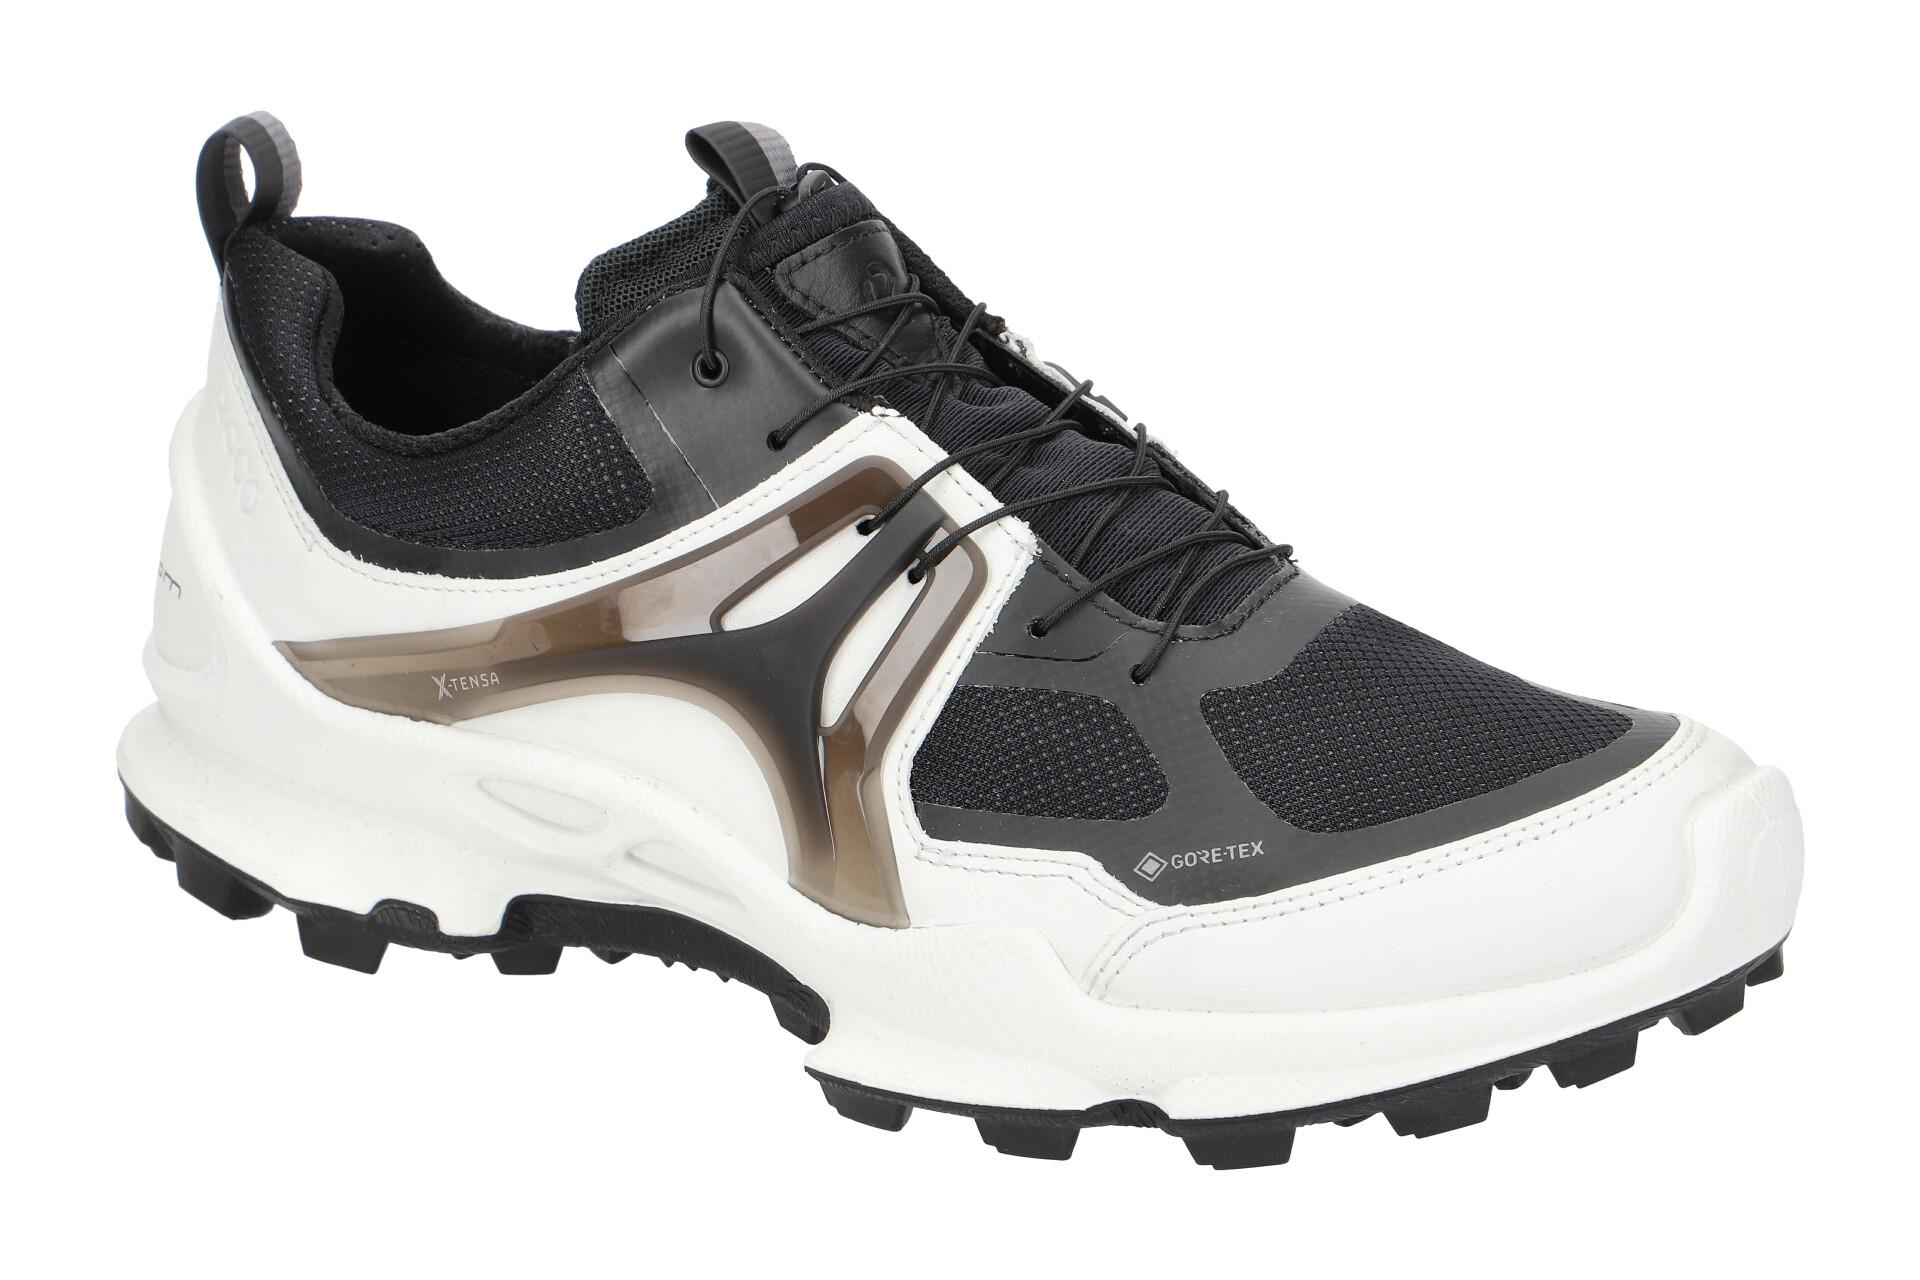 Trekking & Wanderschuhe Outdoor Schuhe für Herren